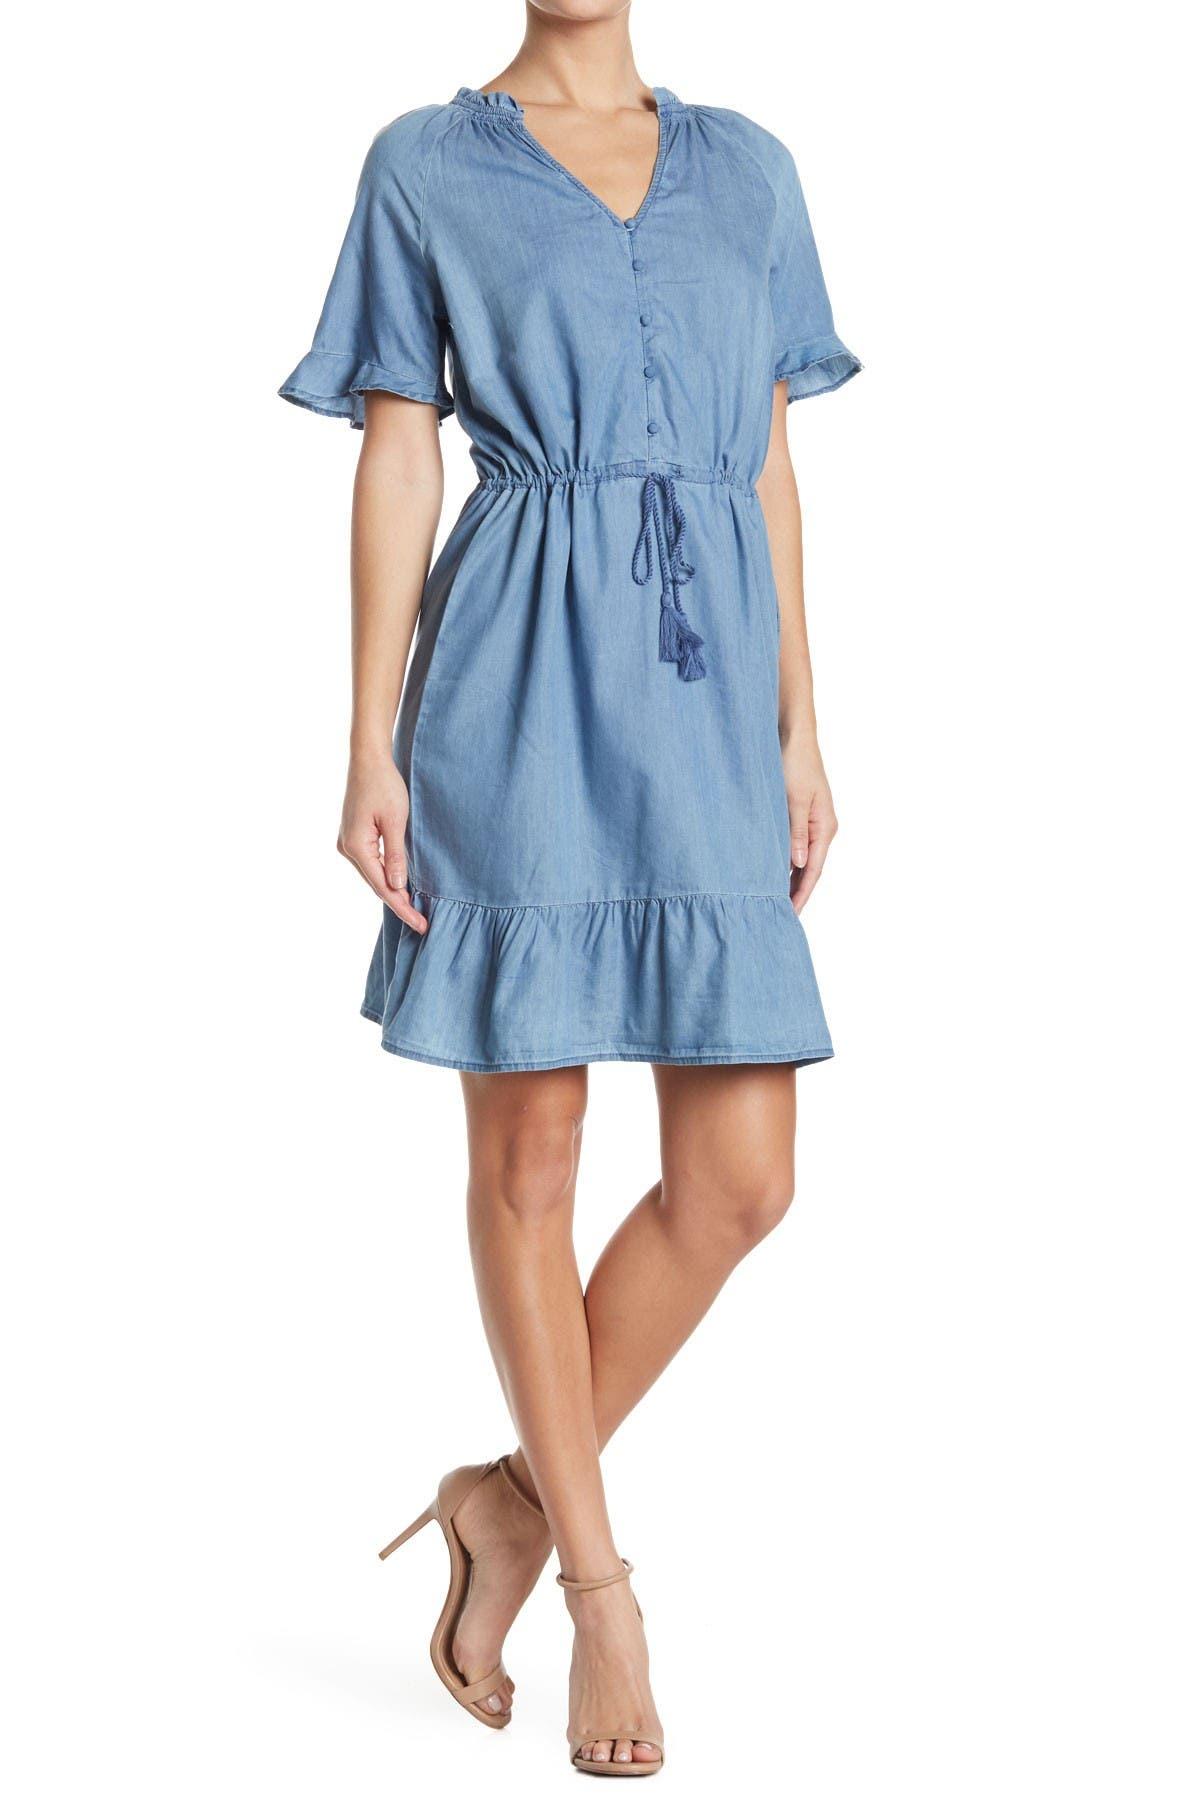 Image of C & C California Emma Woven Tassel Dress